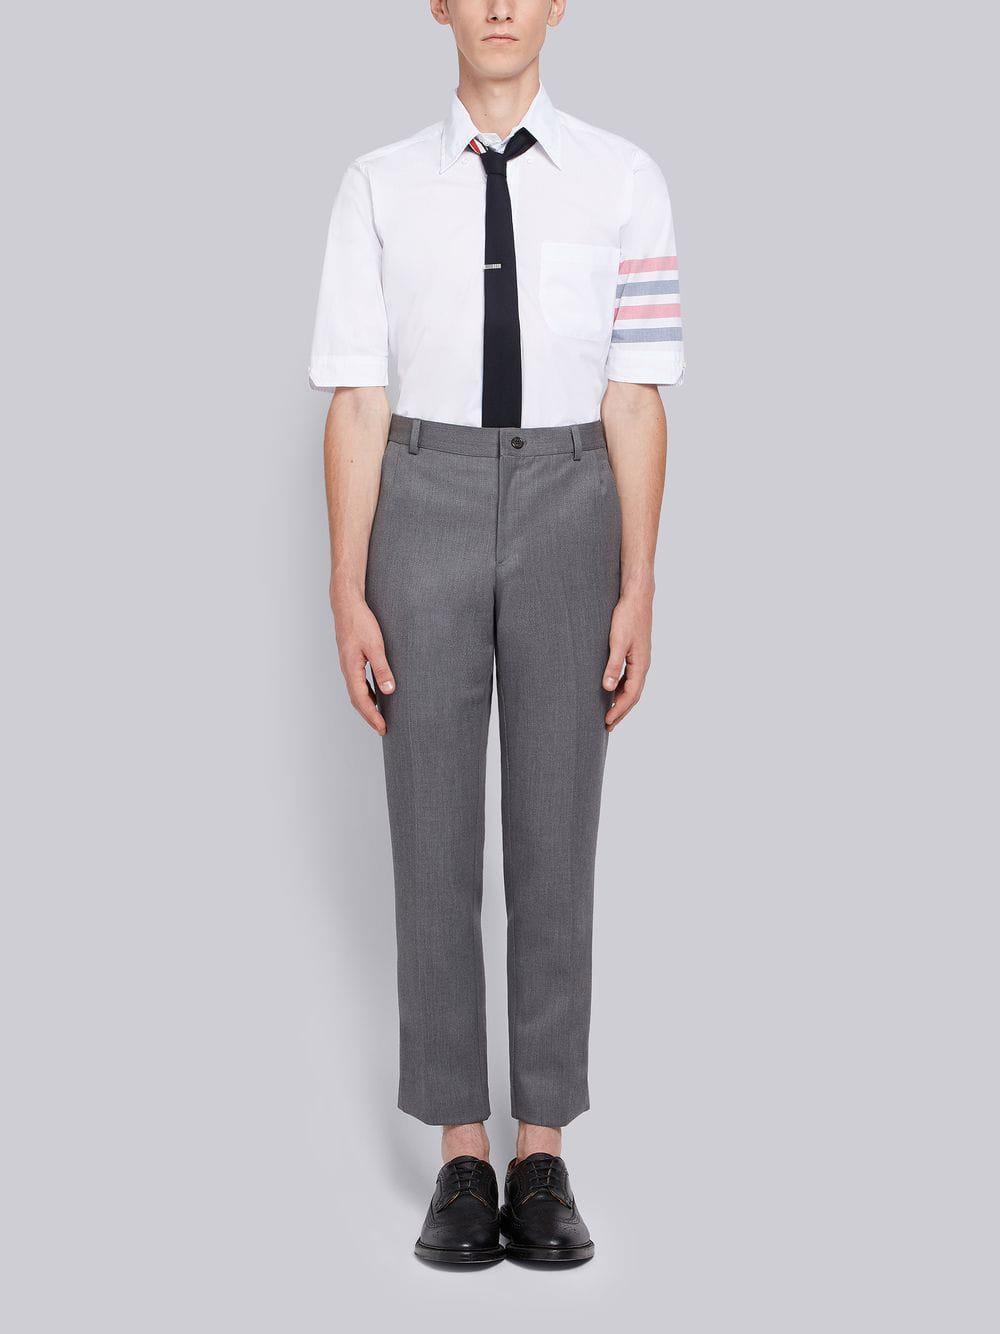 c2b29cfe1bb Thom Browne - White Woven 4-bar Armband Poplin Shirt for Men - Lyst. View  fullscreen